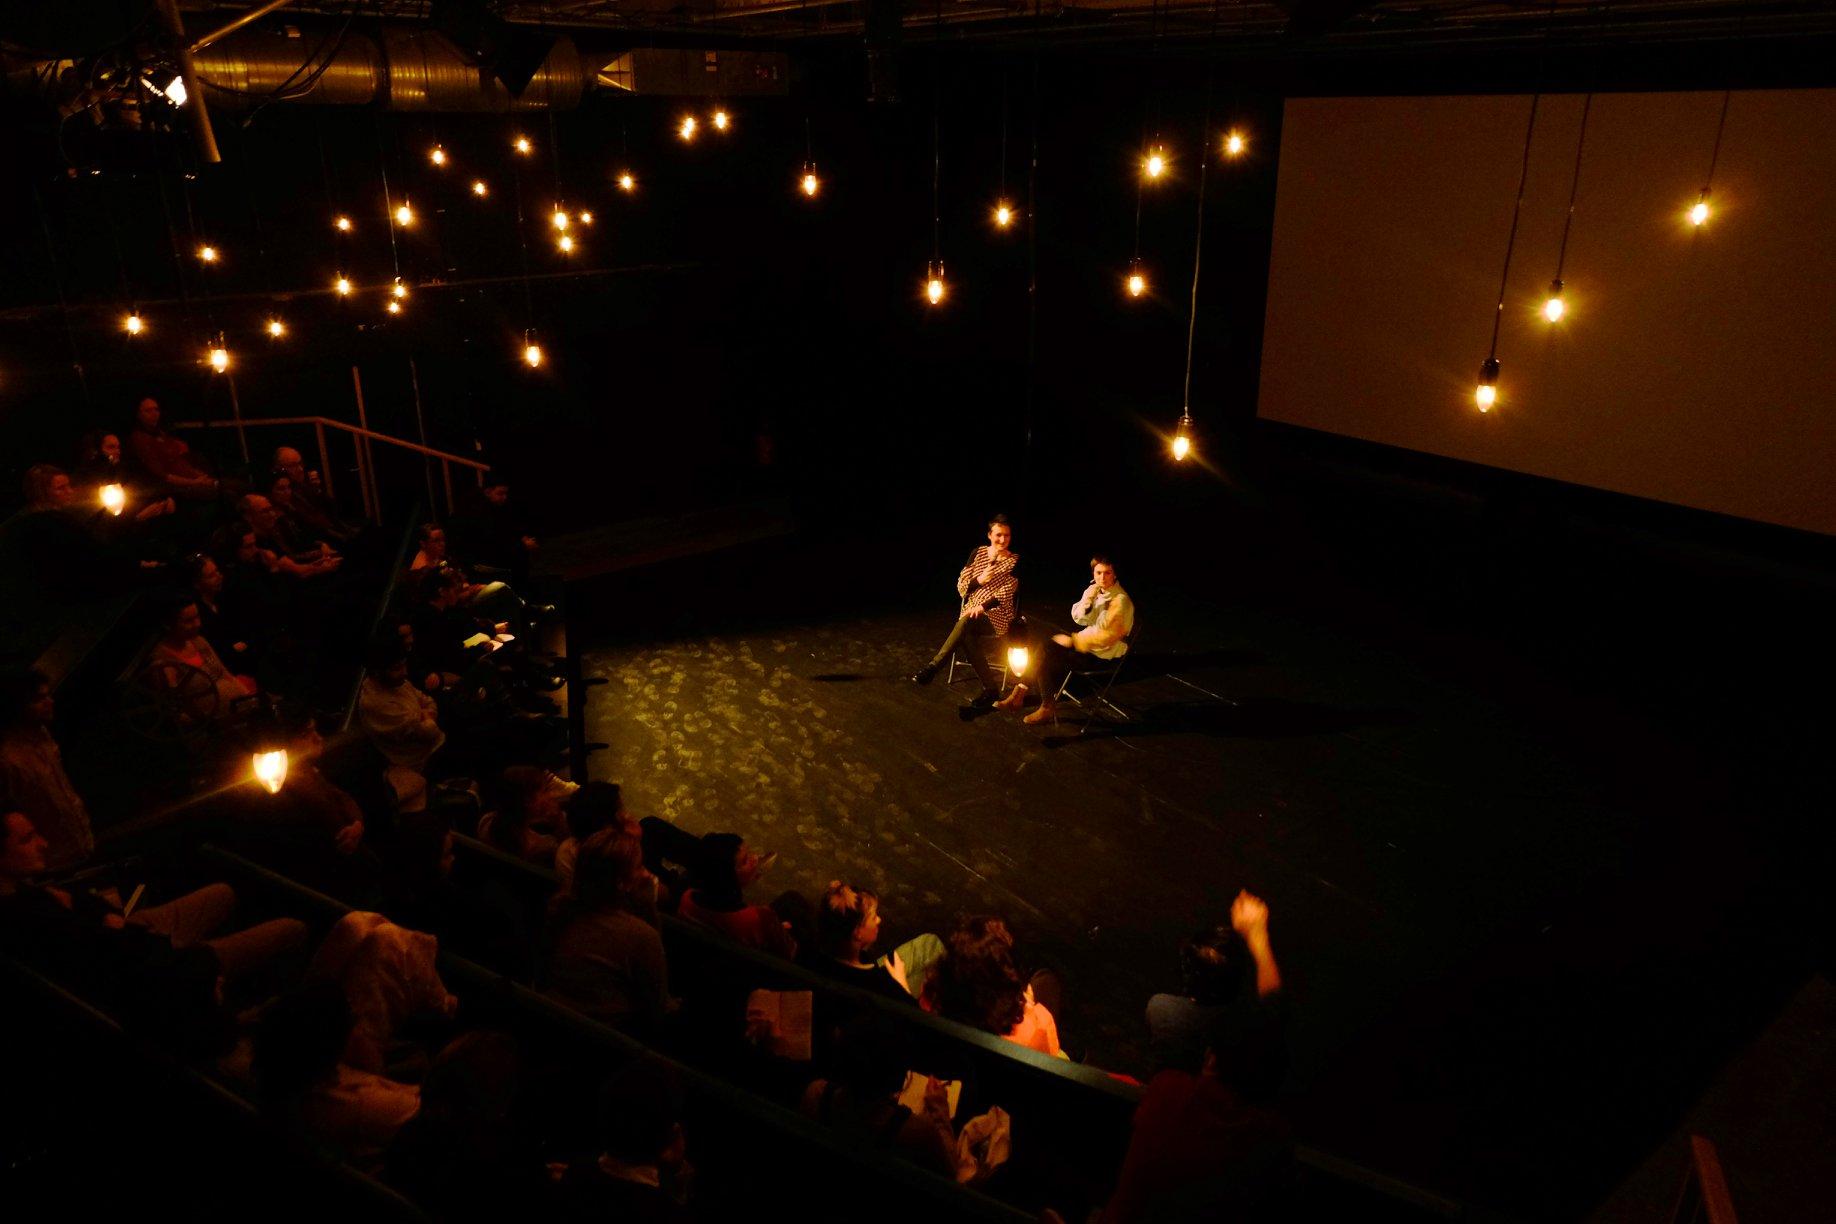 1 - 9 August 2019VISITE FILM FESTIVAL - In August the 7th edition of Visite will take place at Het Bos, Antwerp. In the presence of Bianca Baldi, Arkadi Zaides, Donna Verheijden, Ans Mertens & Lina Laraki, Barbara Prada, Foundland Collective, Meghan Leigh, Hilde D'Haeyere and Anna Dasovic.